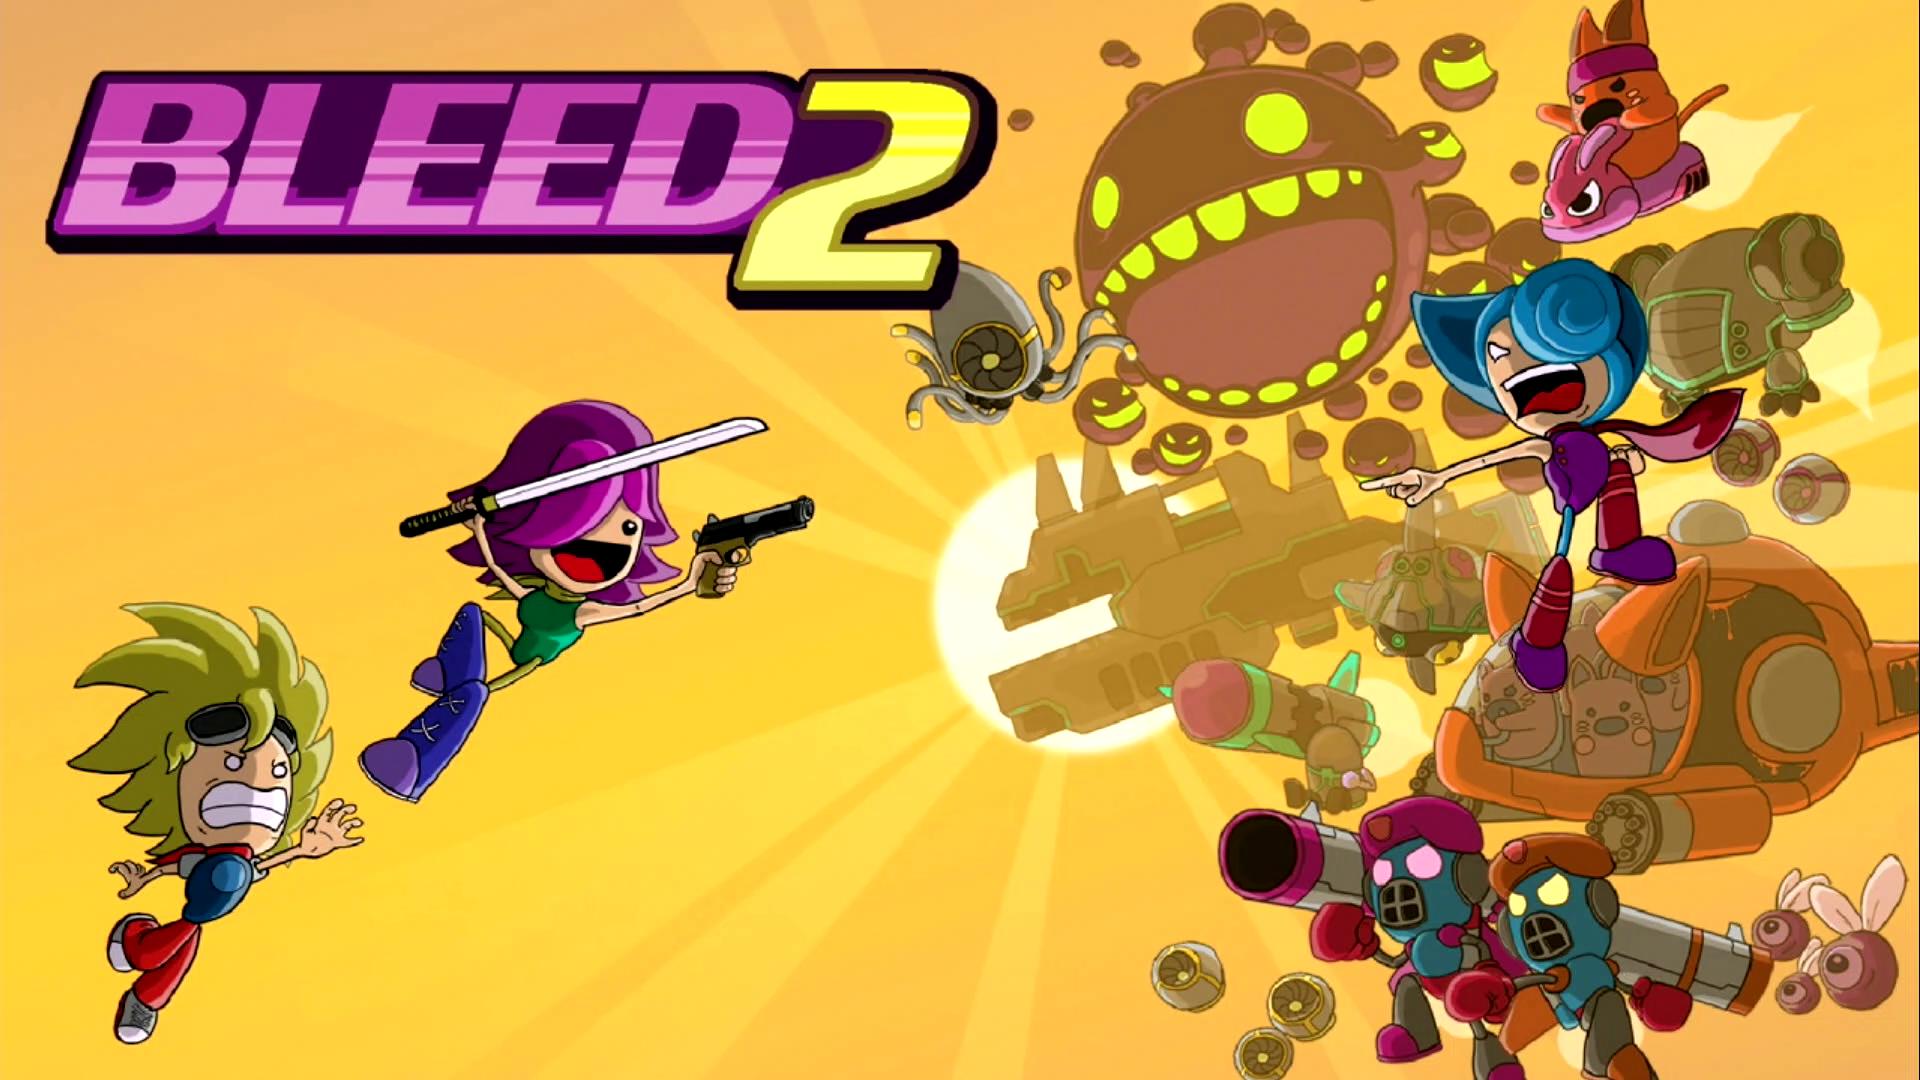 Bleed 2 (Steam Key Region Free) 2019